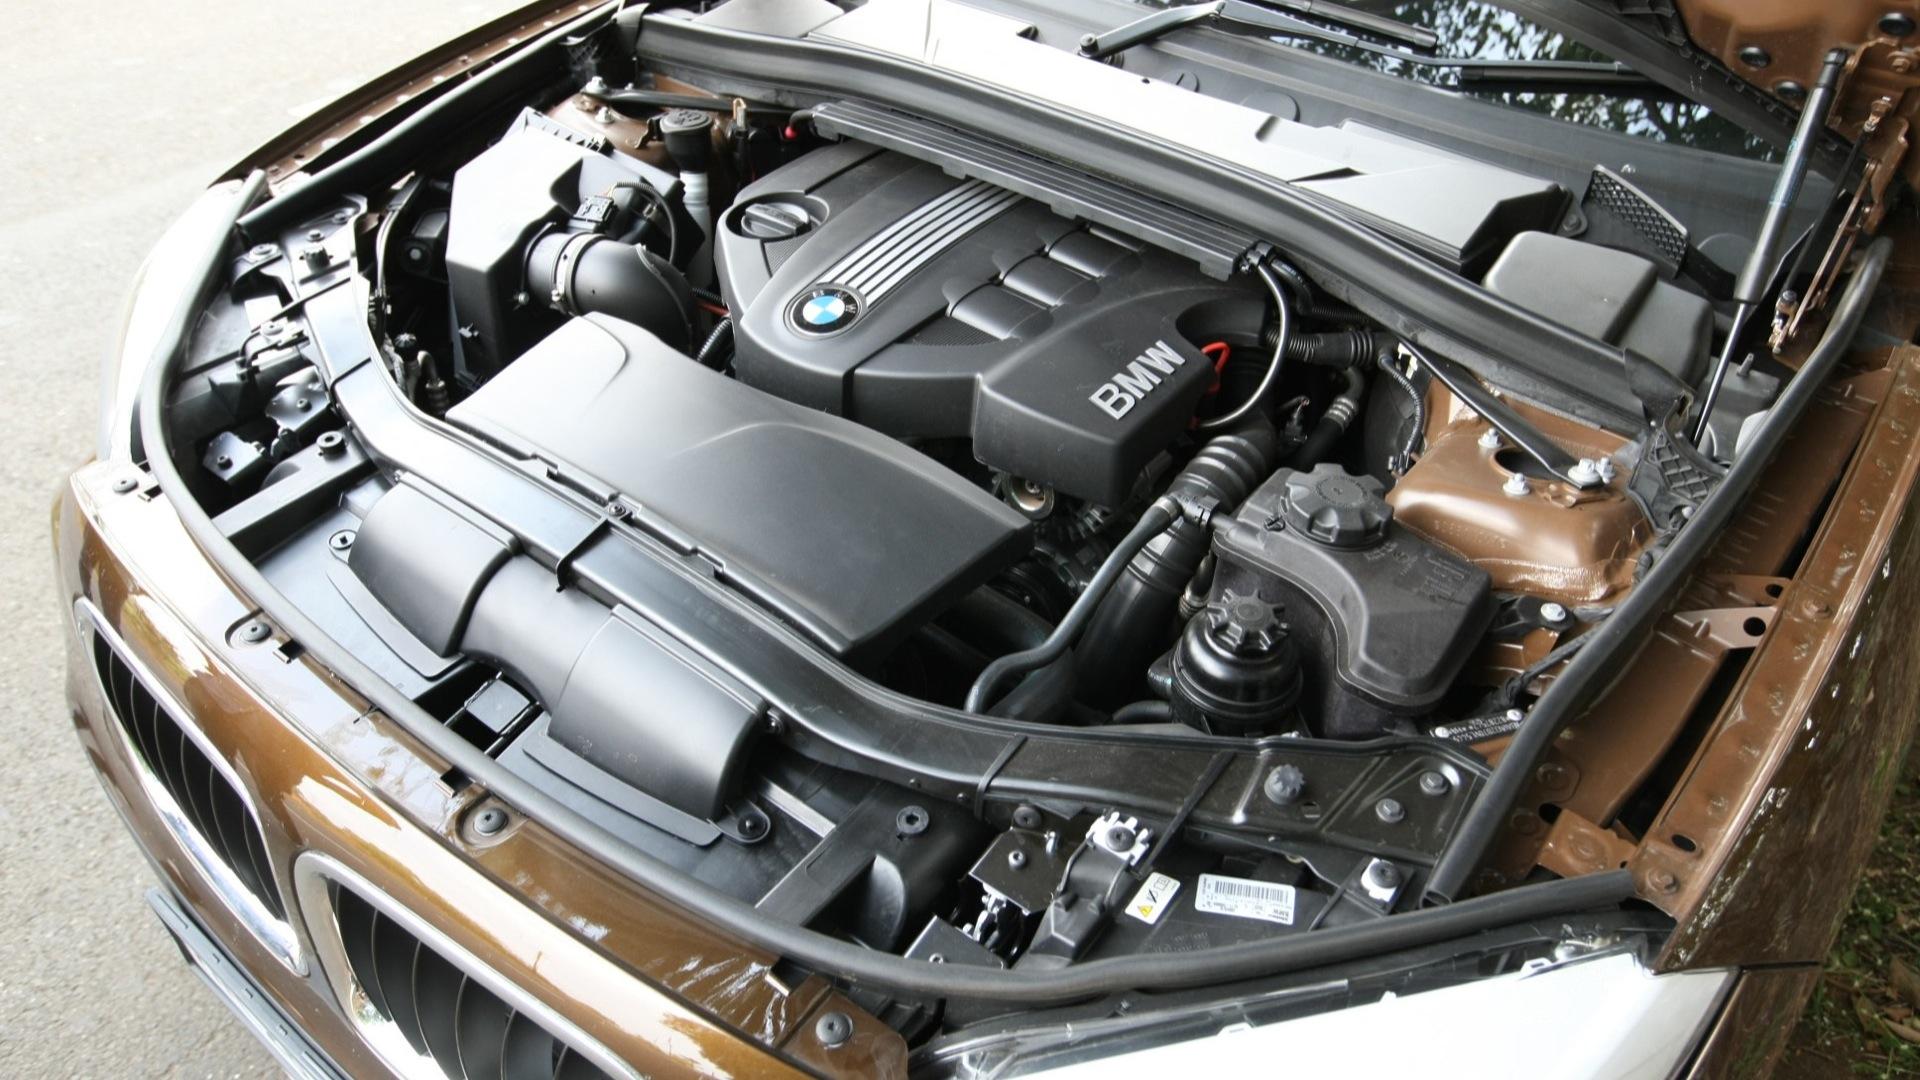 BMW-X1-2013-sDrive-1-8i-Interior